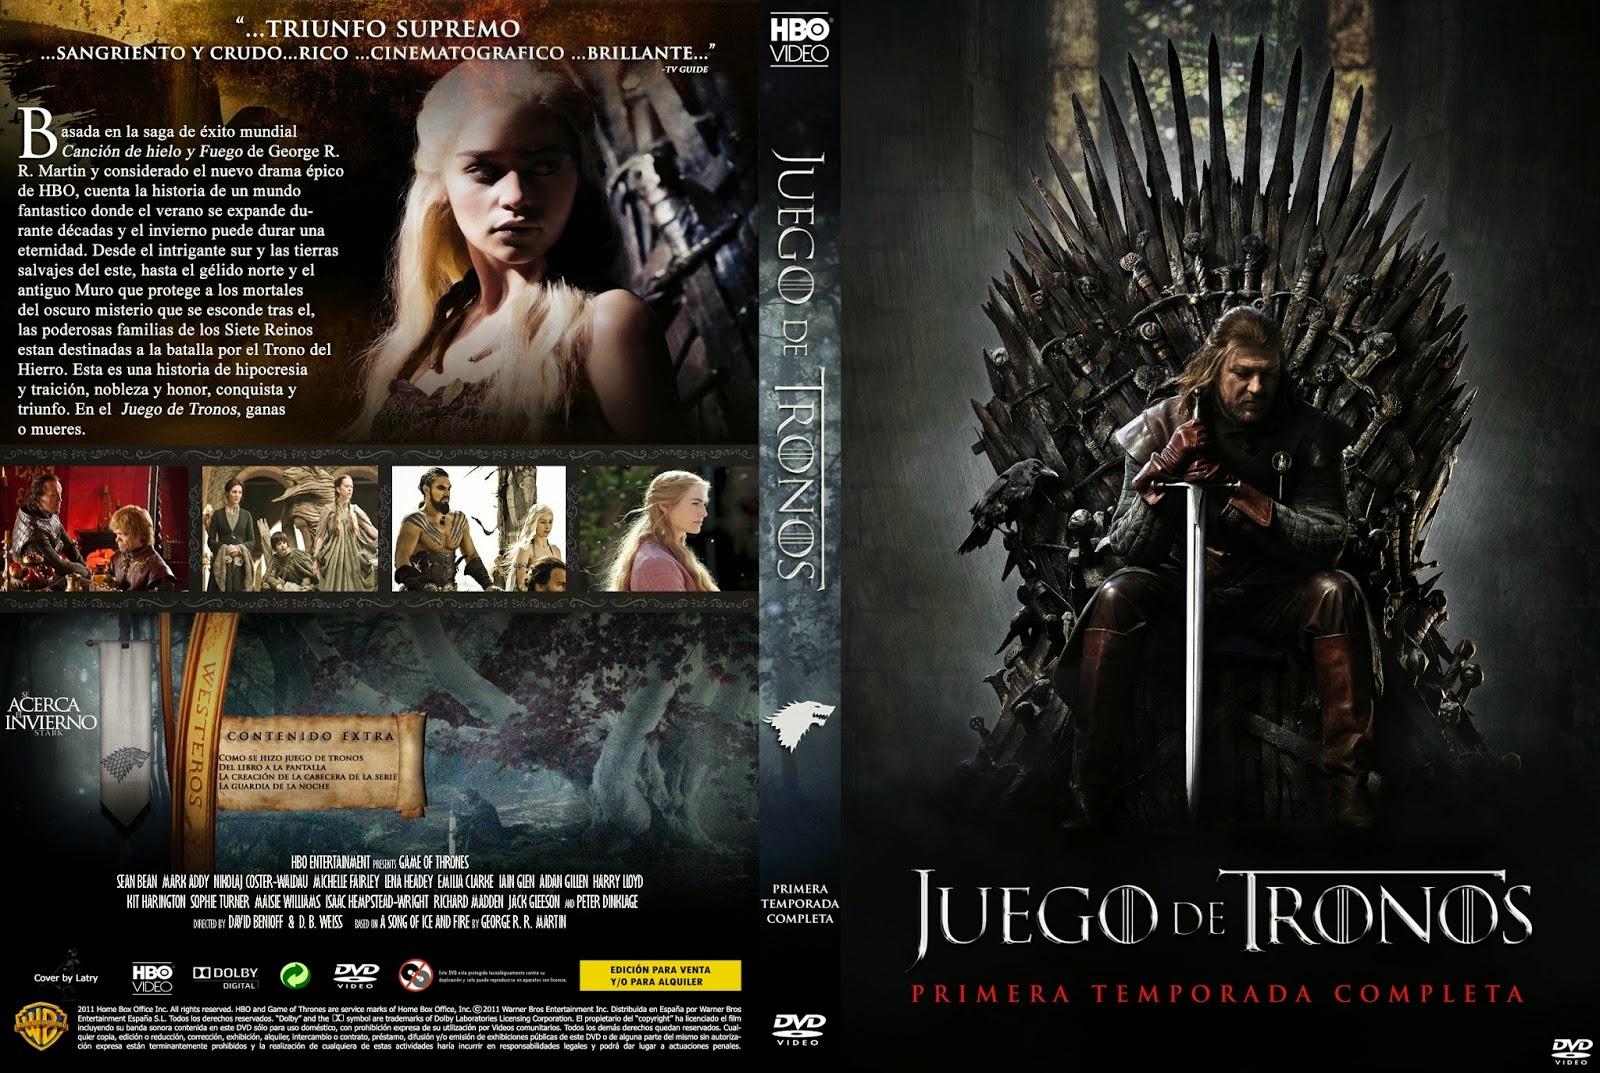 Descargar Juego De Tronos Temporada 1 Castellano Mega Millions ...